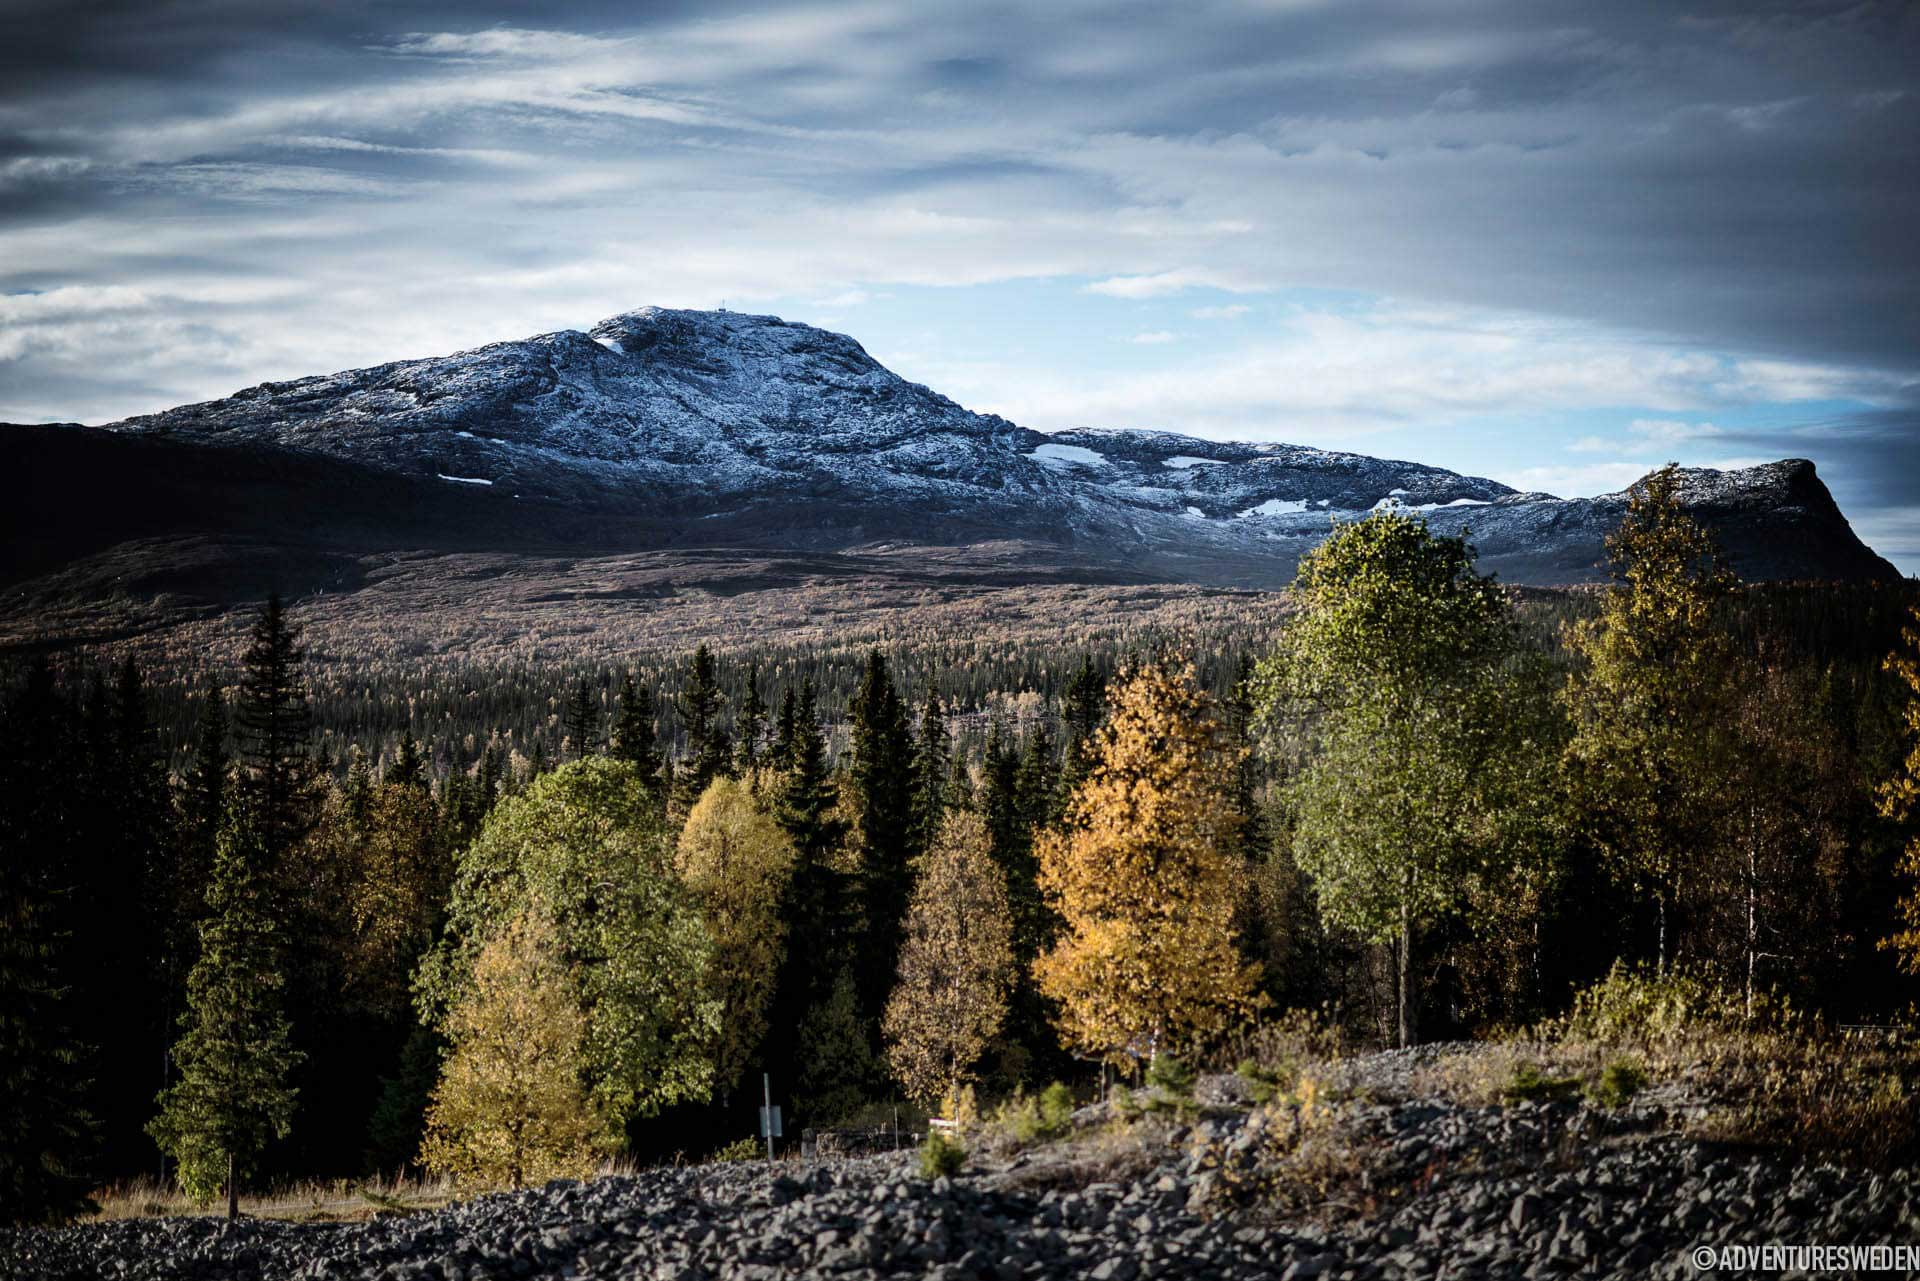 Vy över Åreskutan, Fröå Gruva, Åre | Foto: Sandra Lee Pettersson